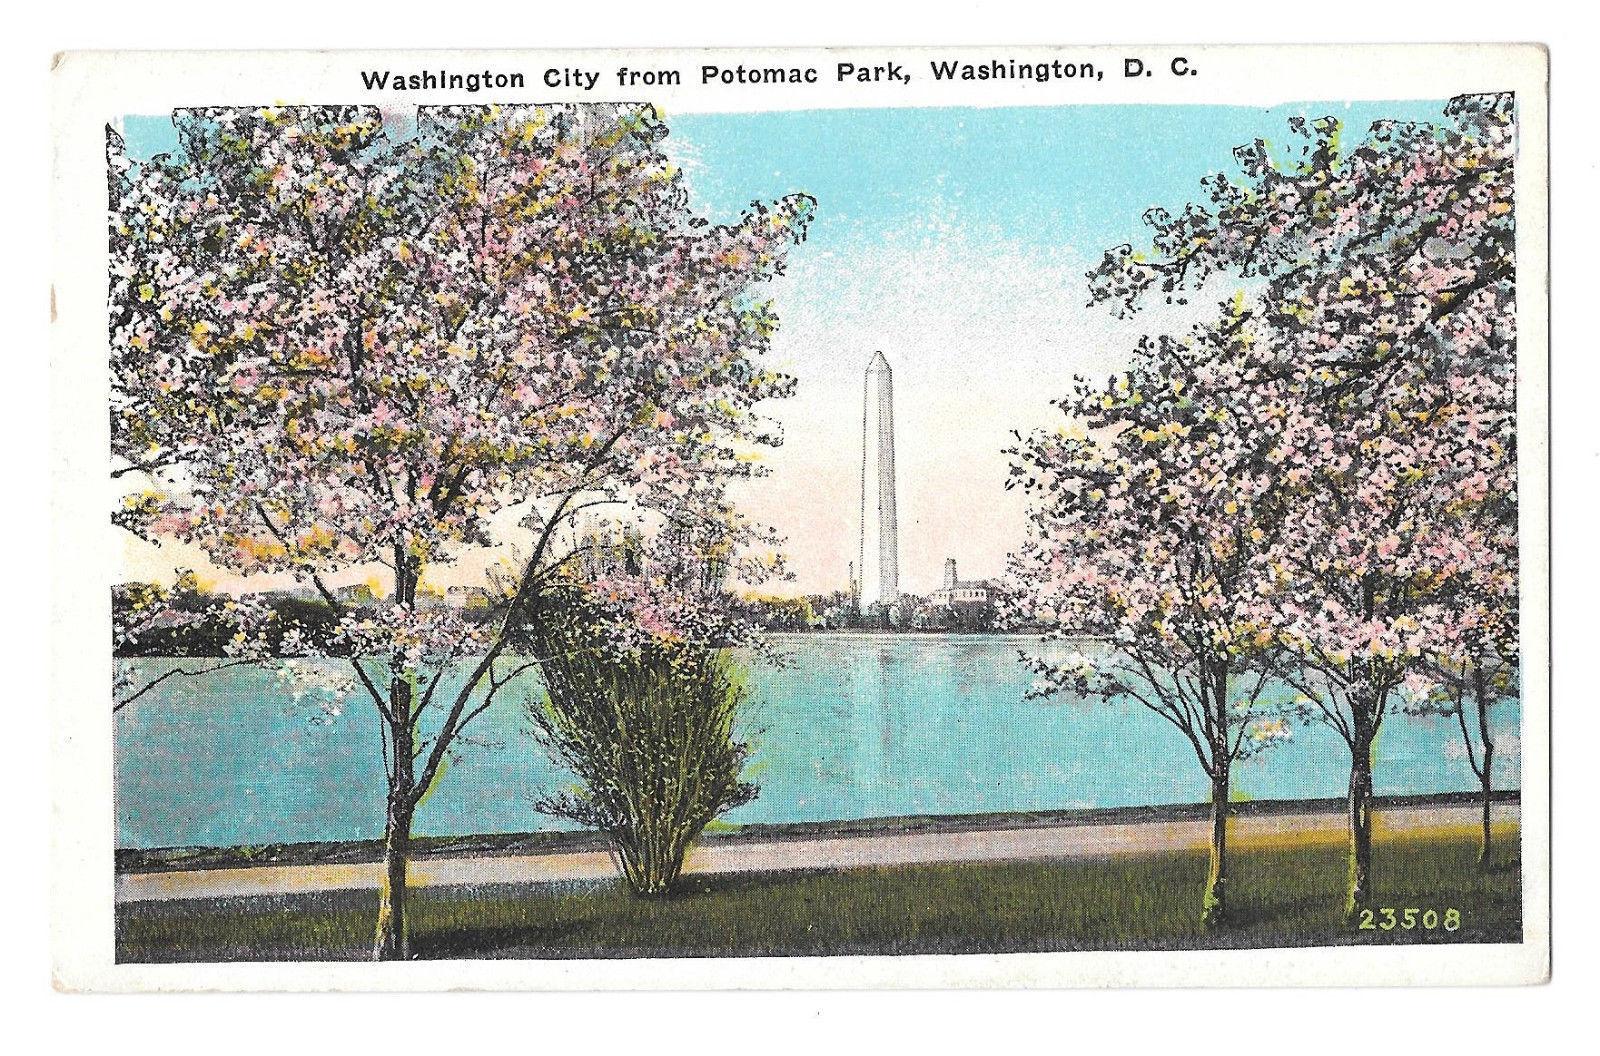 Washington DC Washington Monument Potomac Park Cherry Blossoms Vtg Postcard